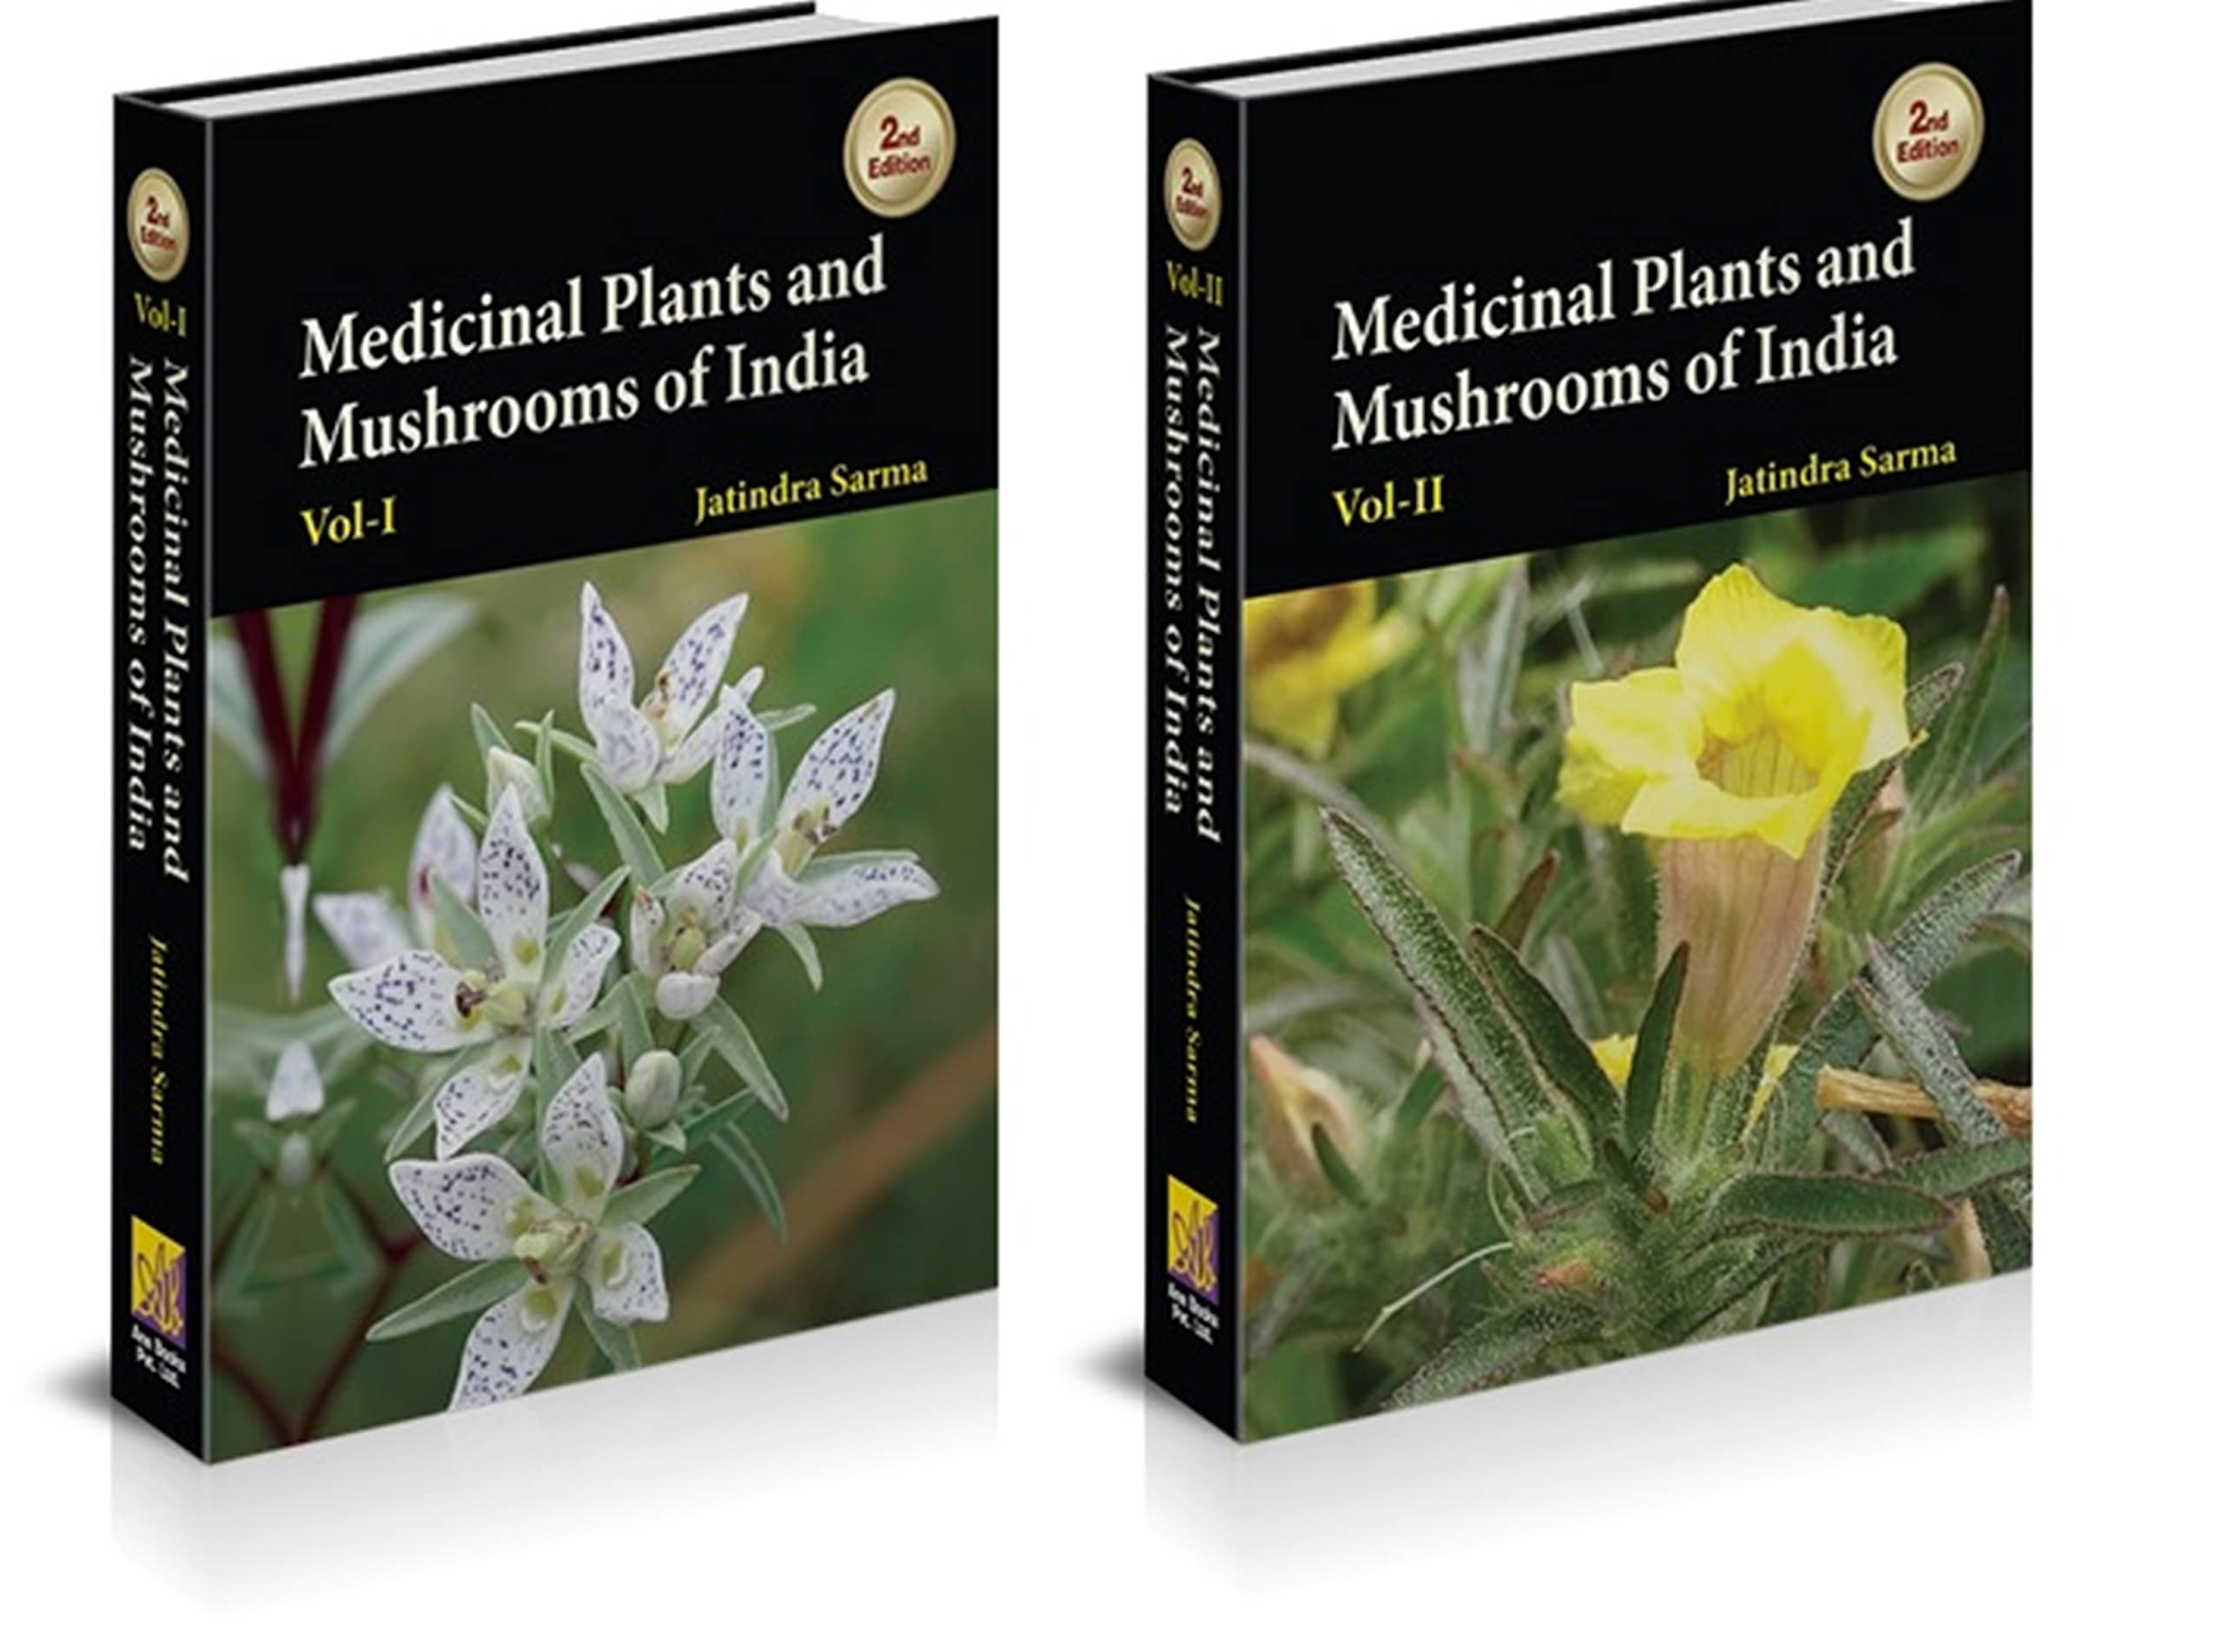 Medicinal Plants and Mushrooms of India (2 Vols)